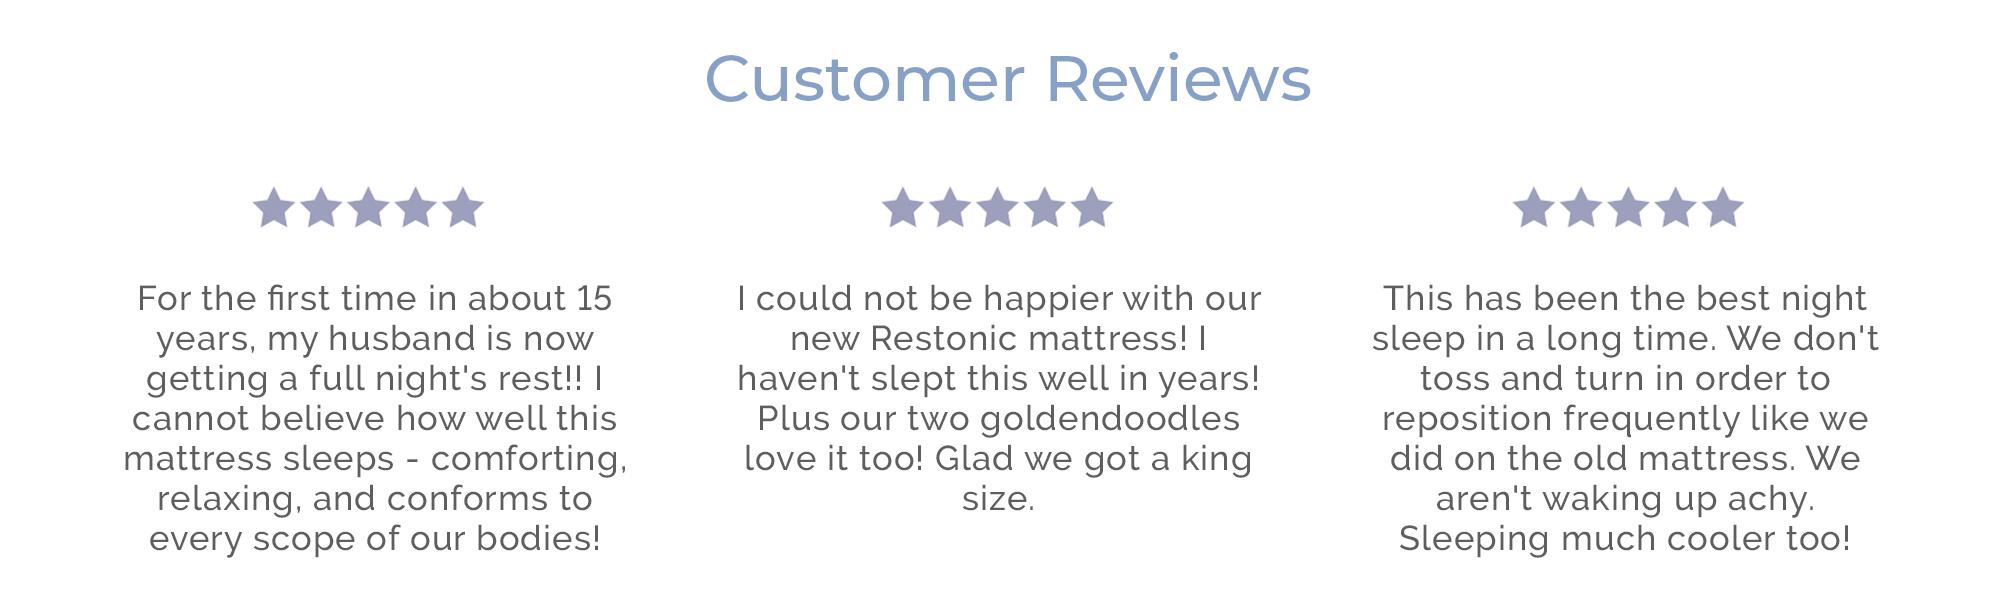 Restonic Customer Reviews